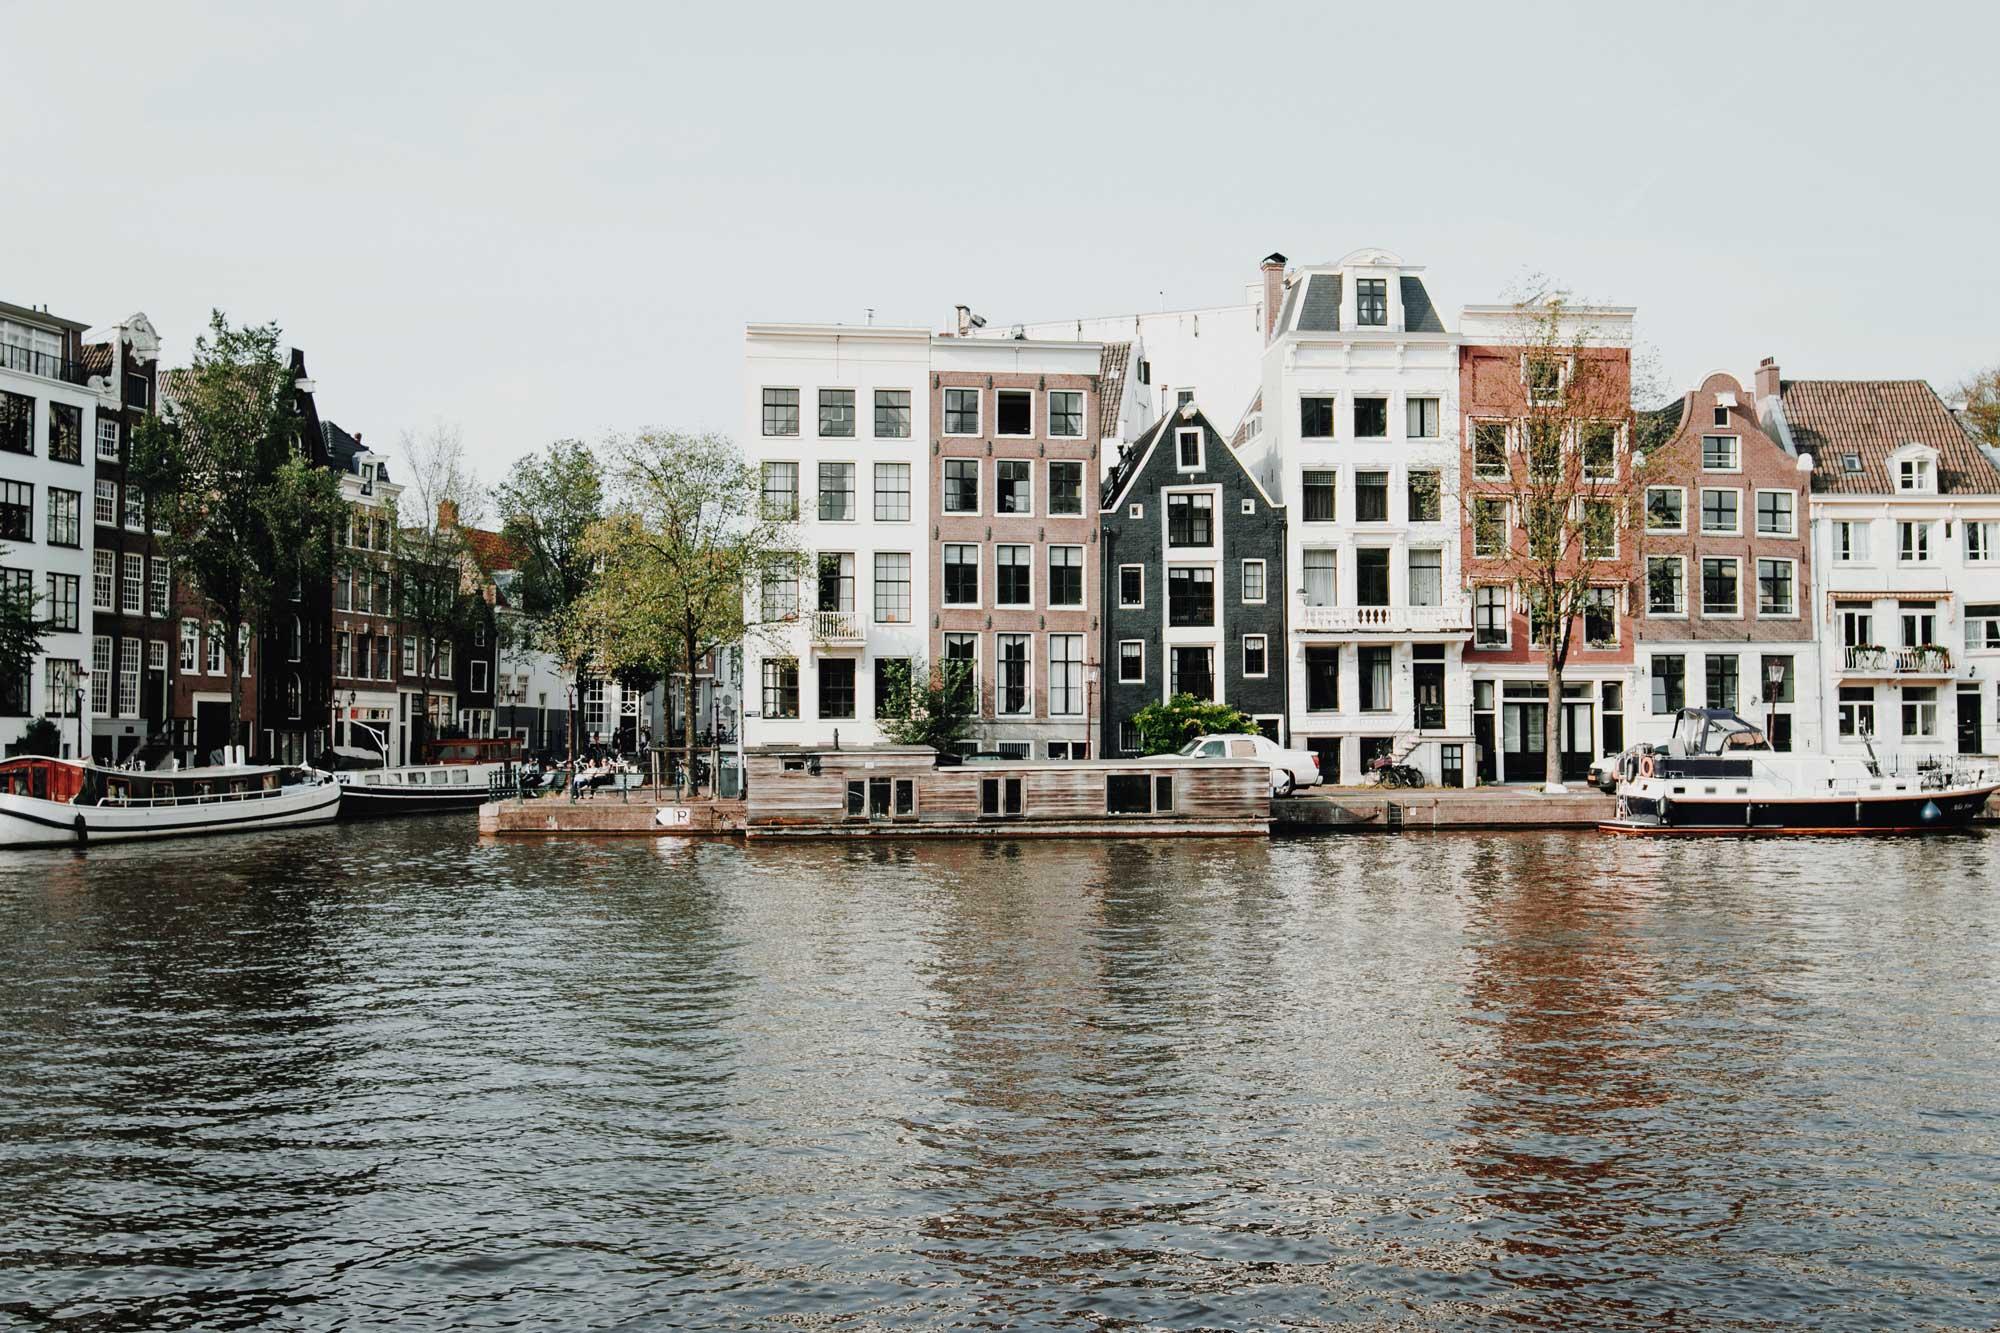 Zabrana Airbnb Amsterdam